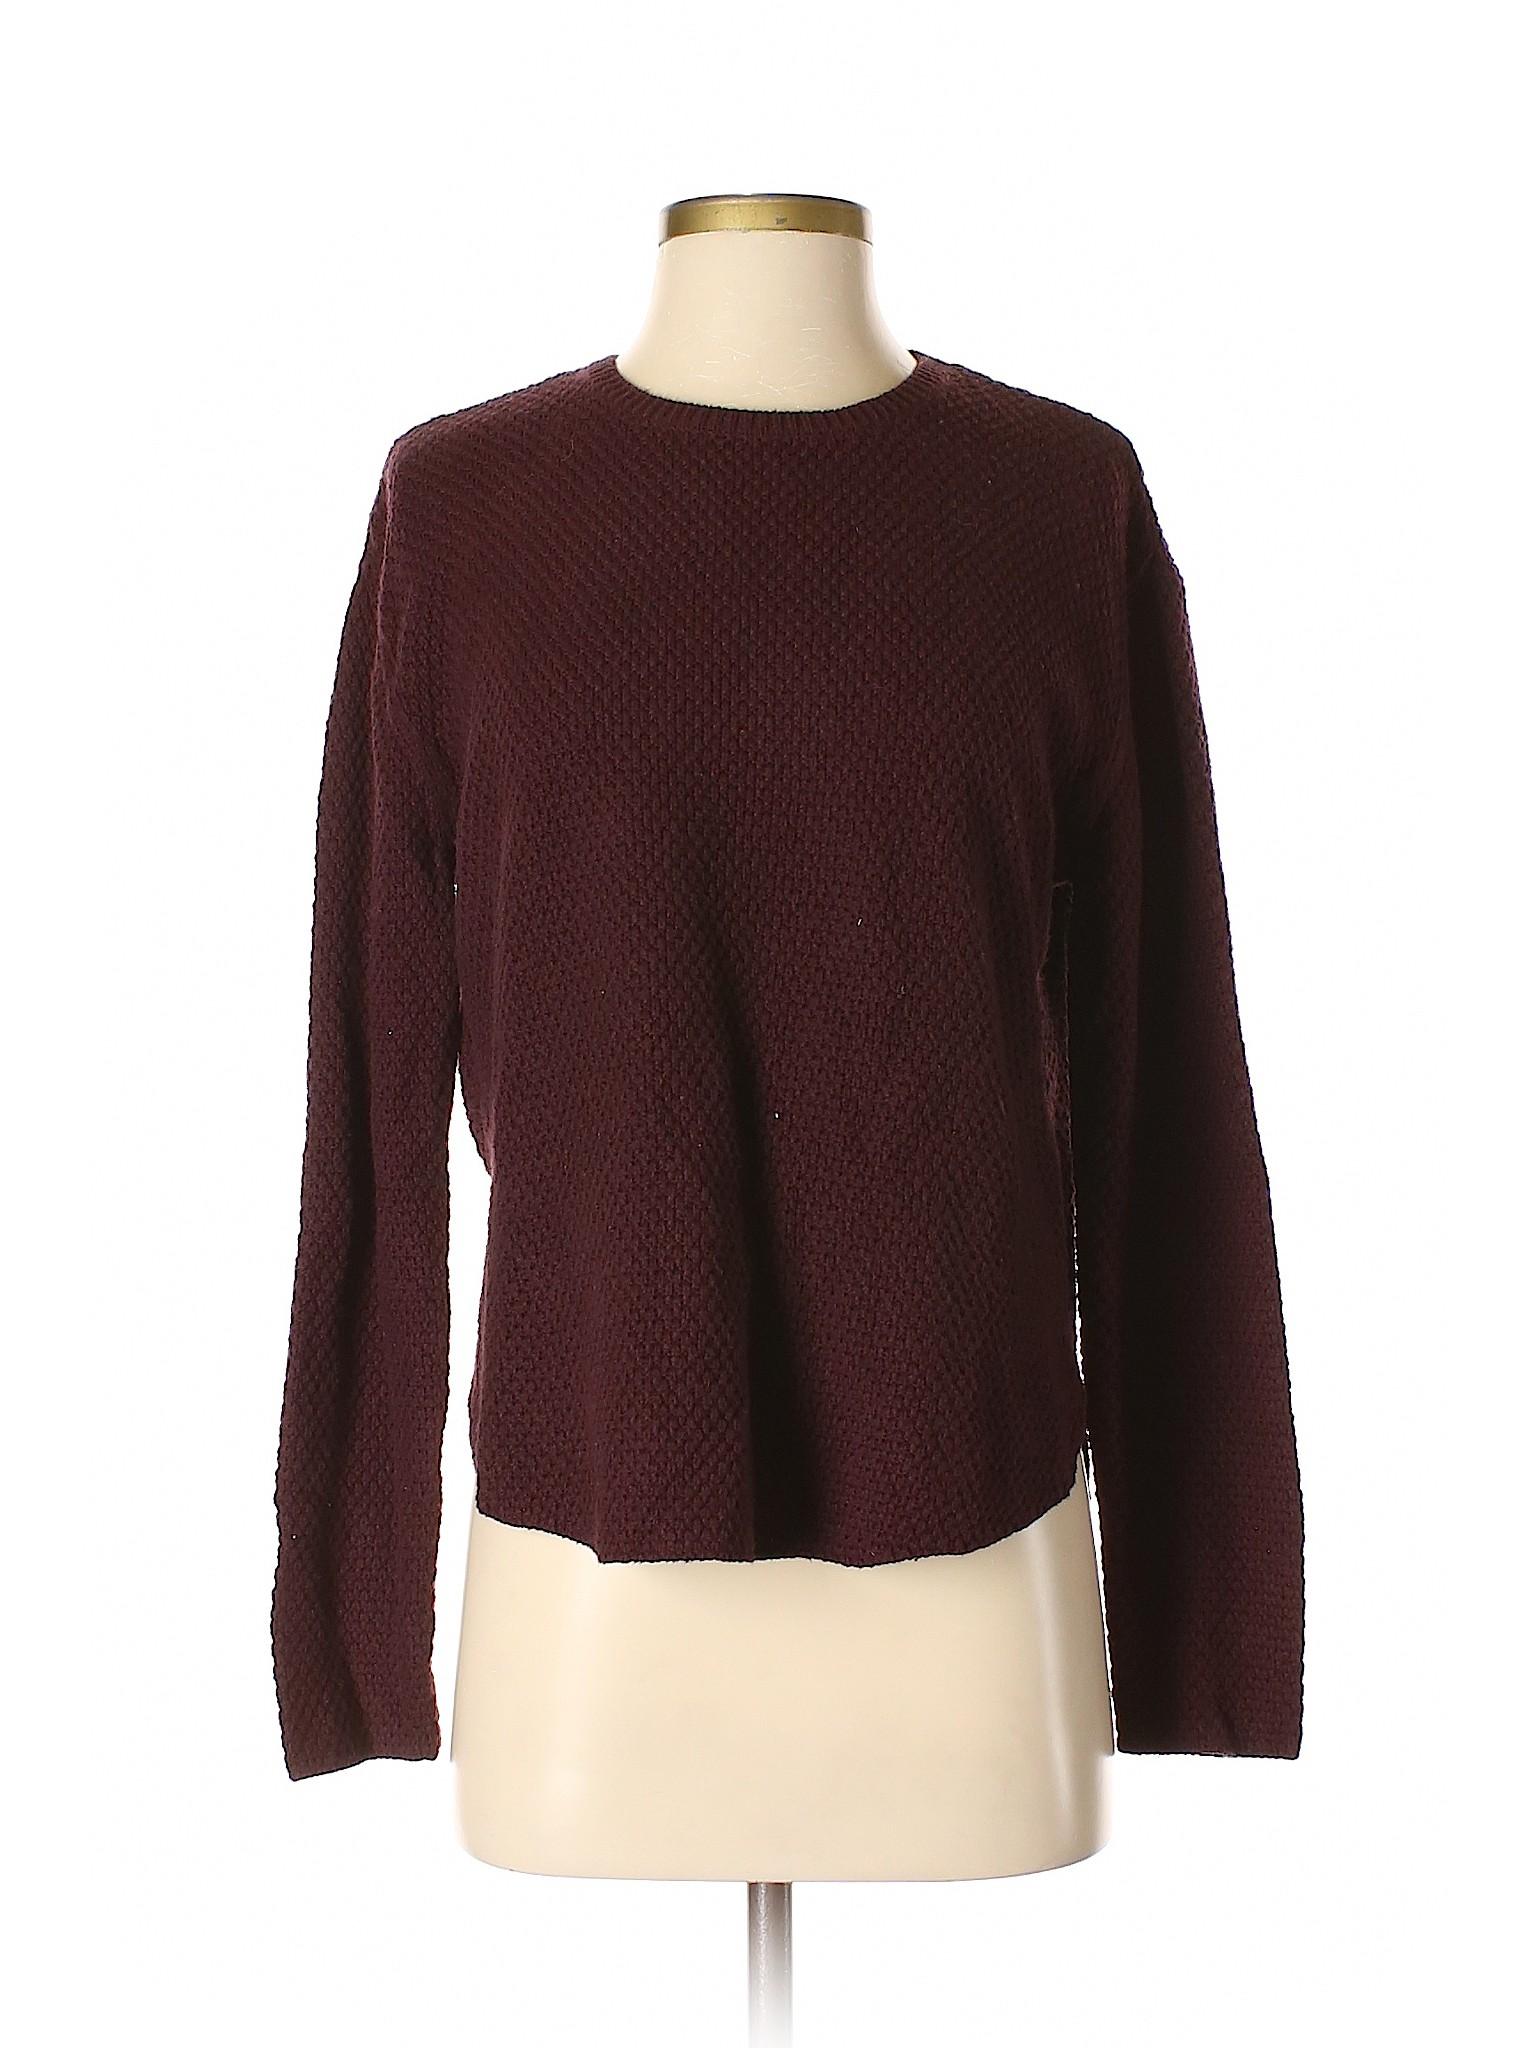 winter LOFT Pullover Sweater Ann Taylor Boutique PawSpqa